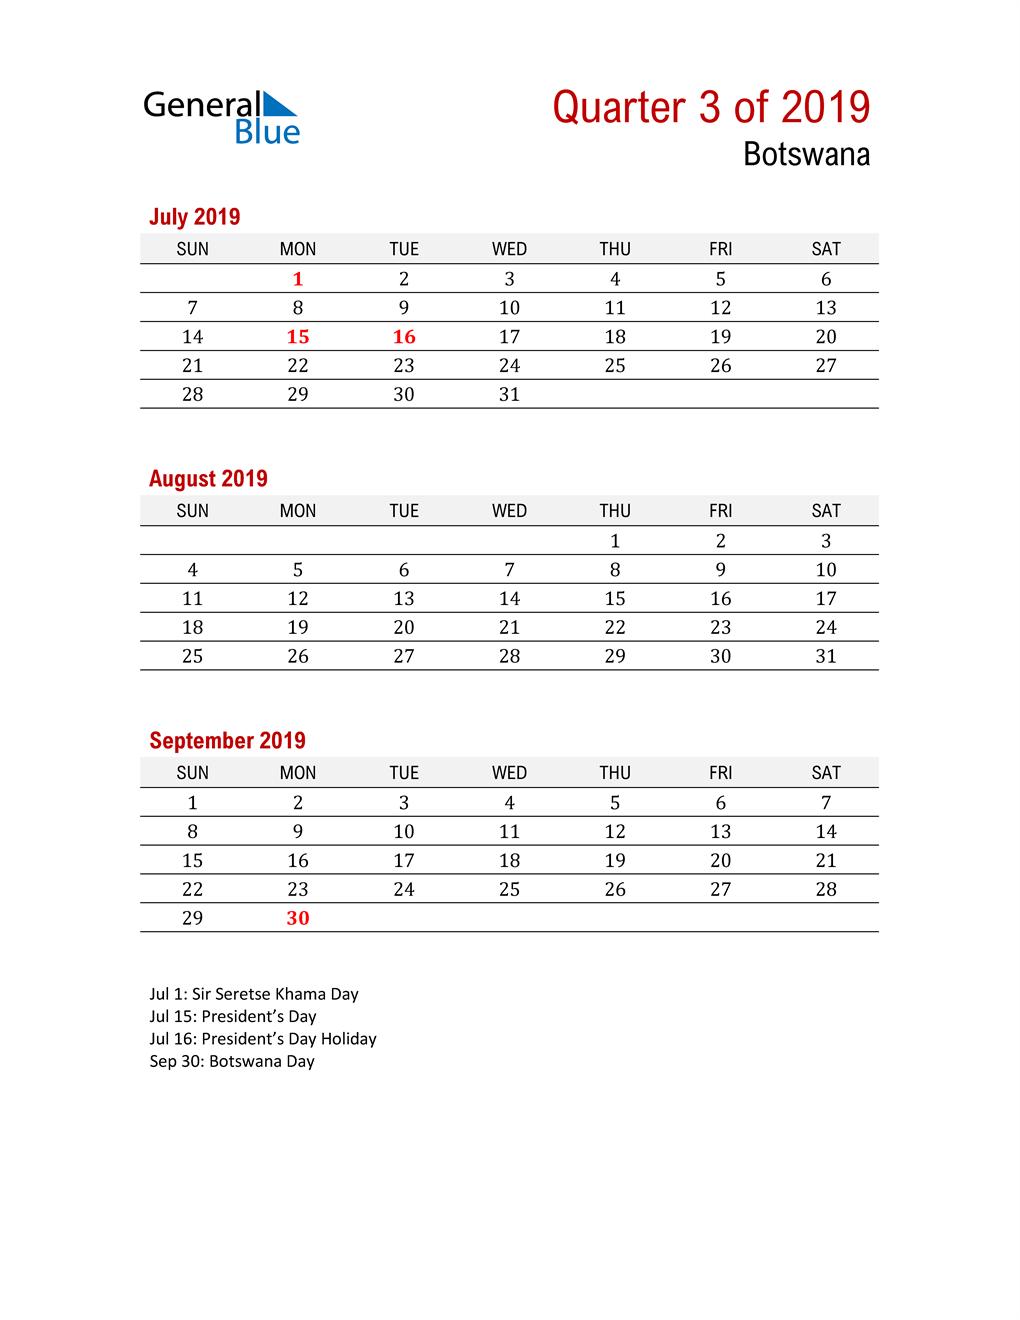 Printable Three Month Calendar for Botswana